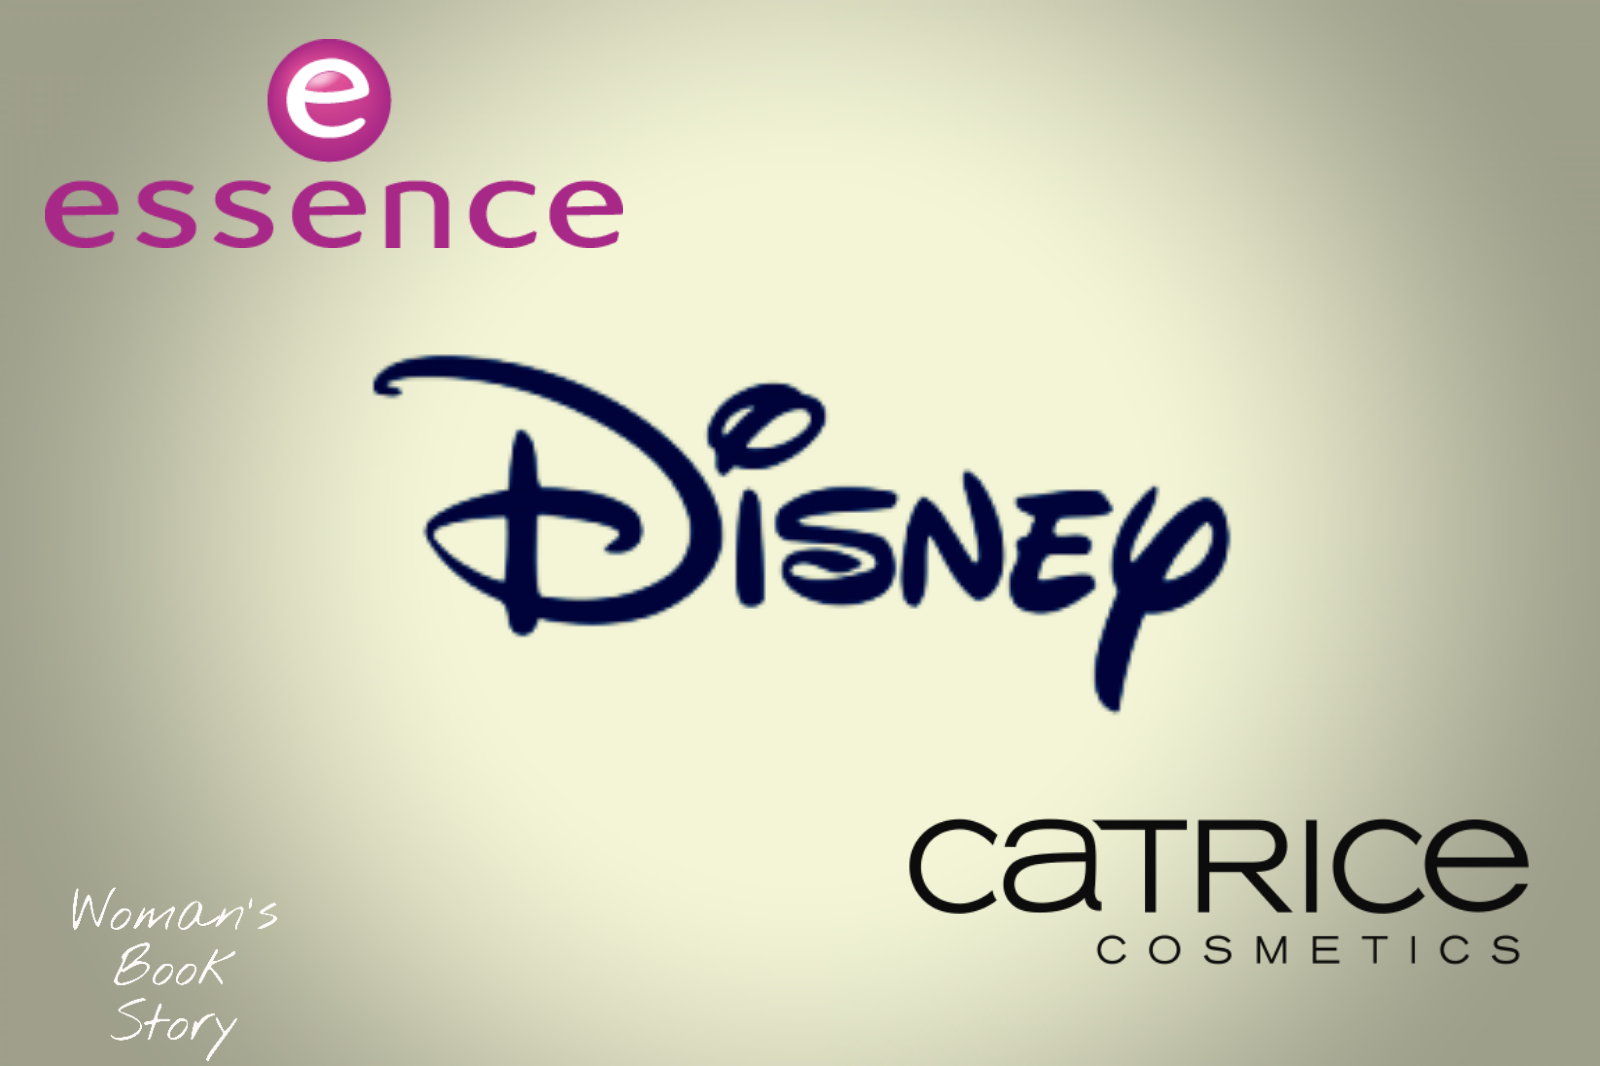 Essence Catrice Disney